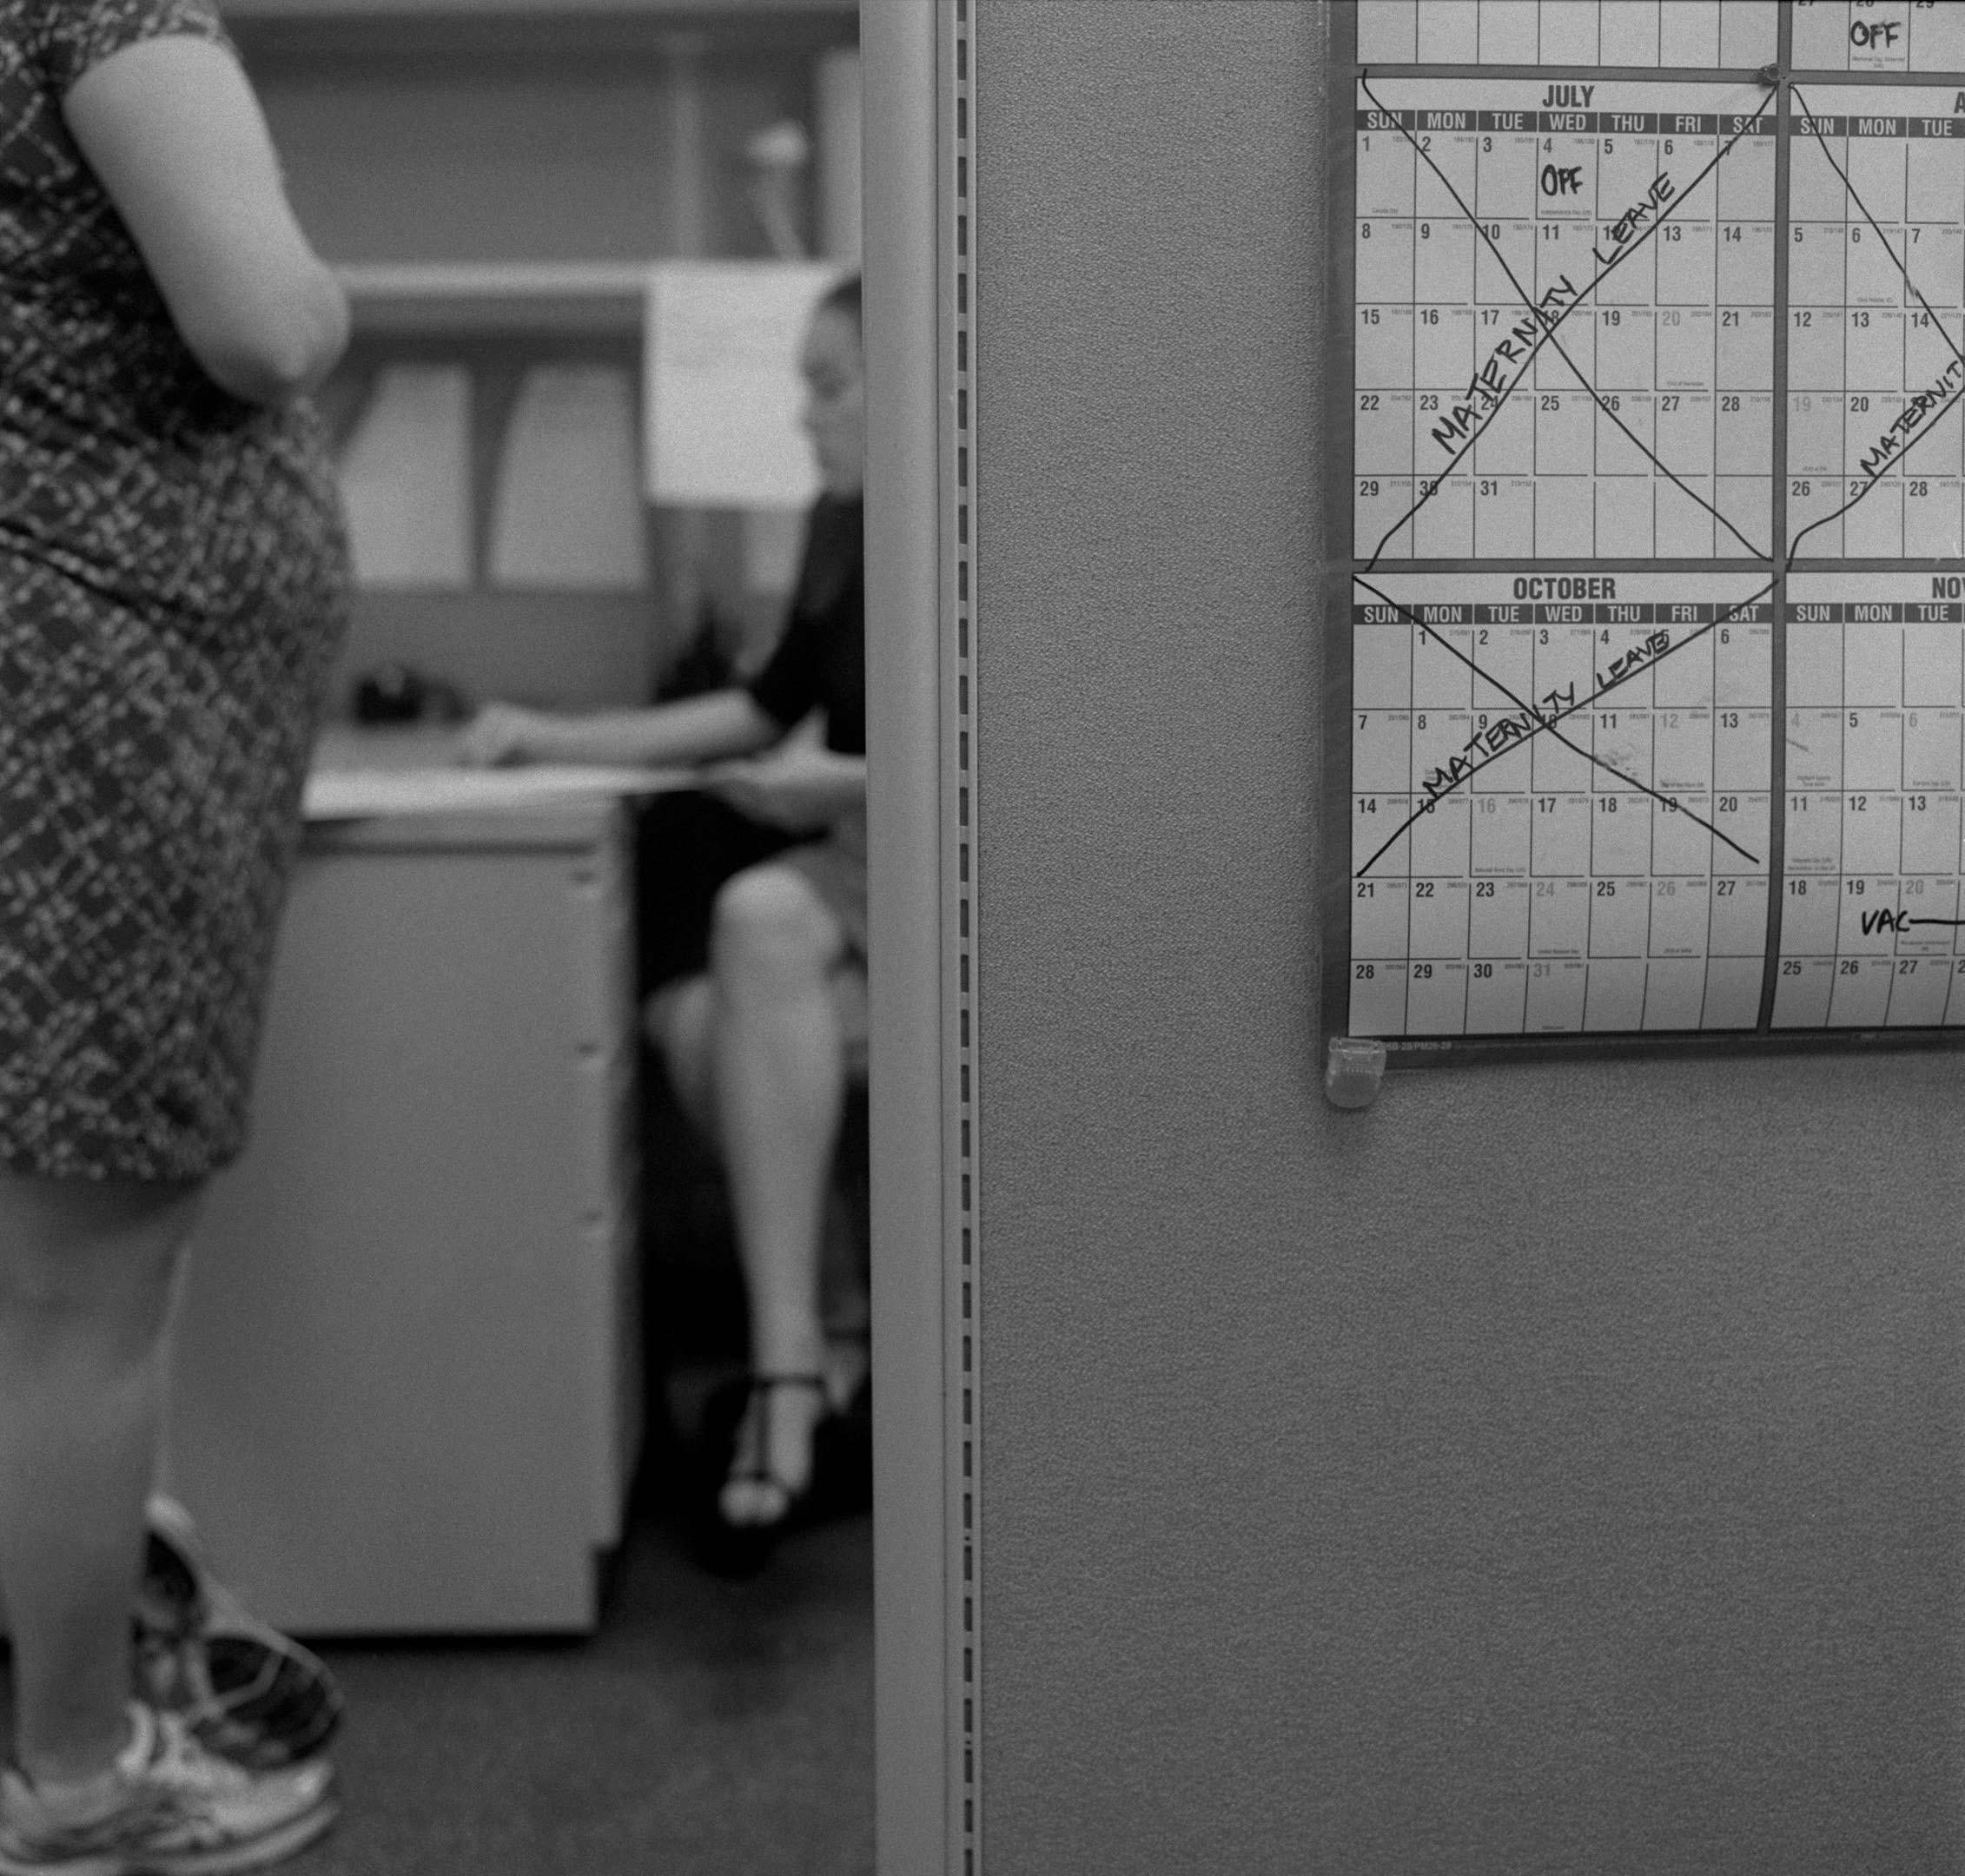 LYNDA, SENIOR PROGRAM MANAGER - 2012, © Amanda Tinker